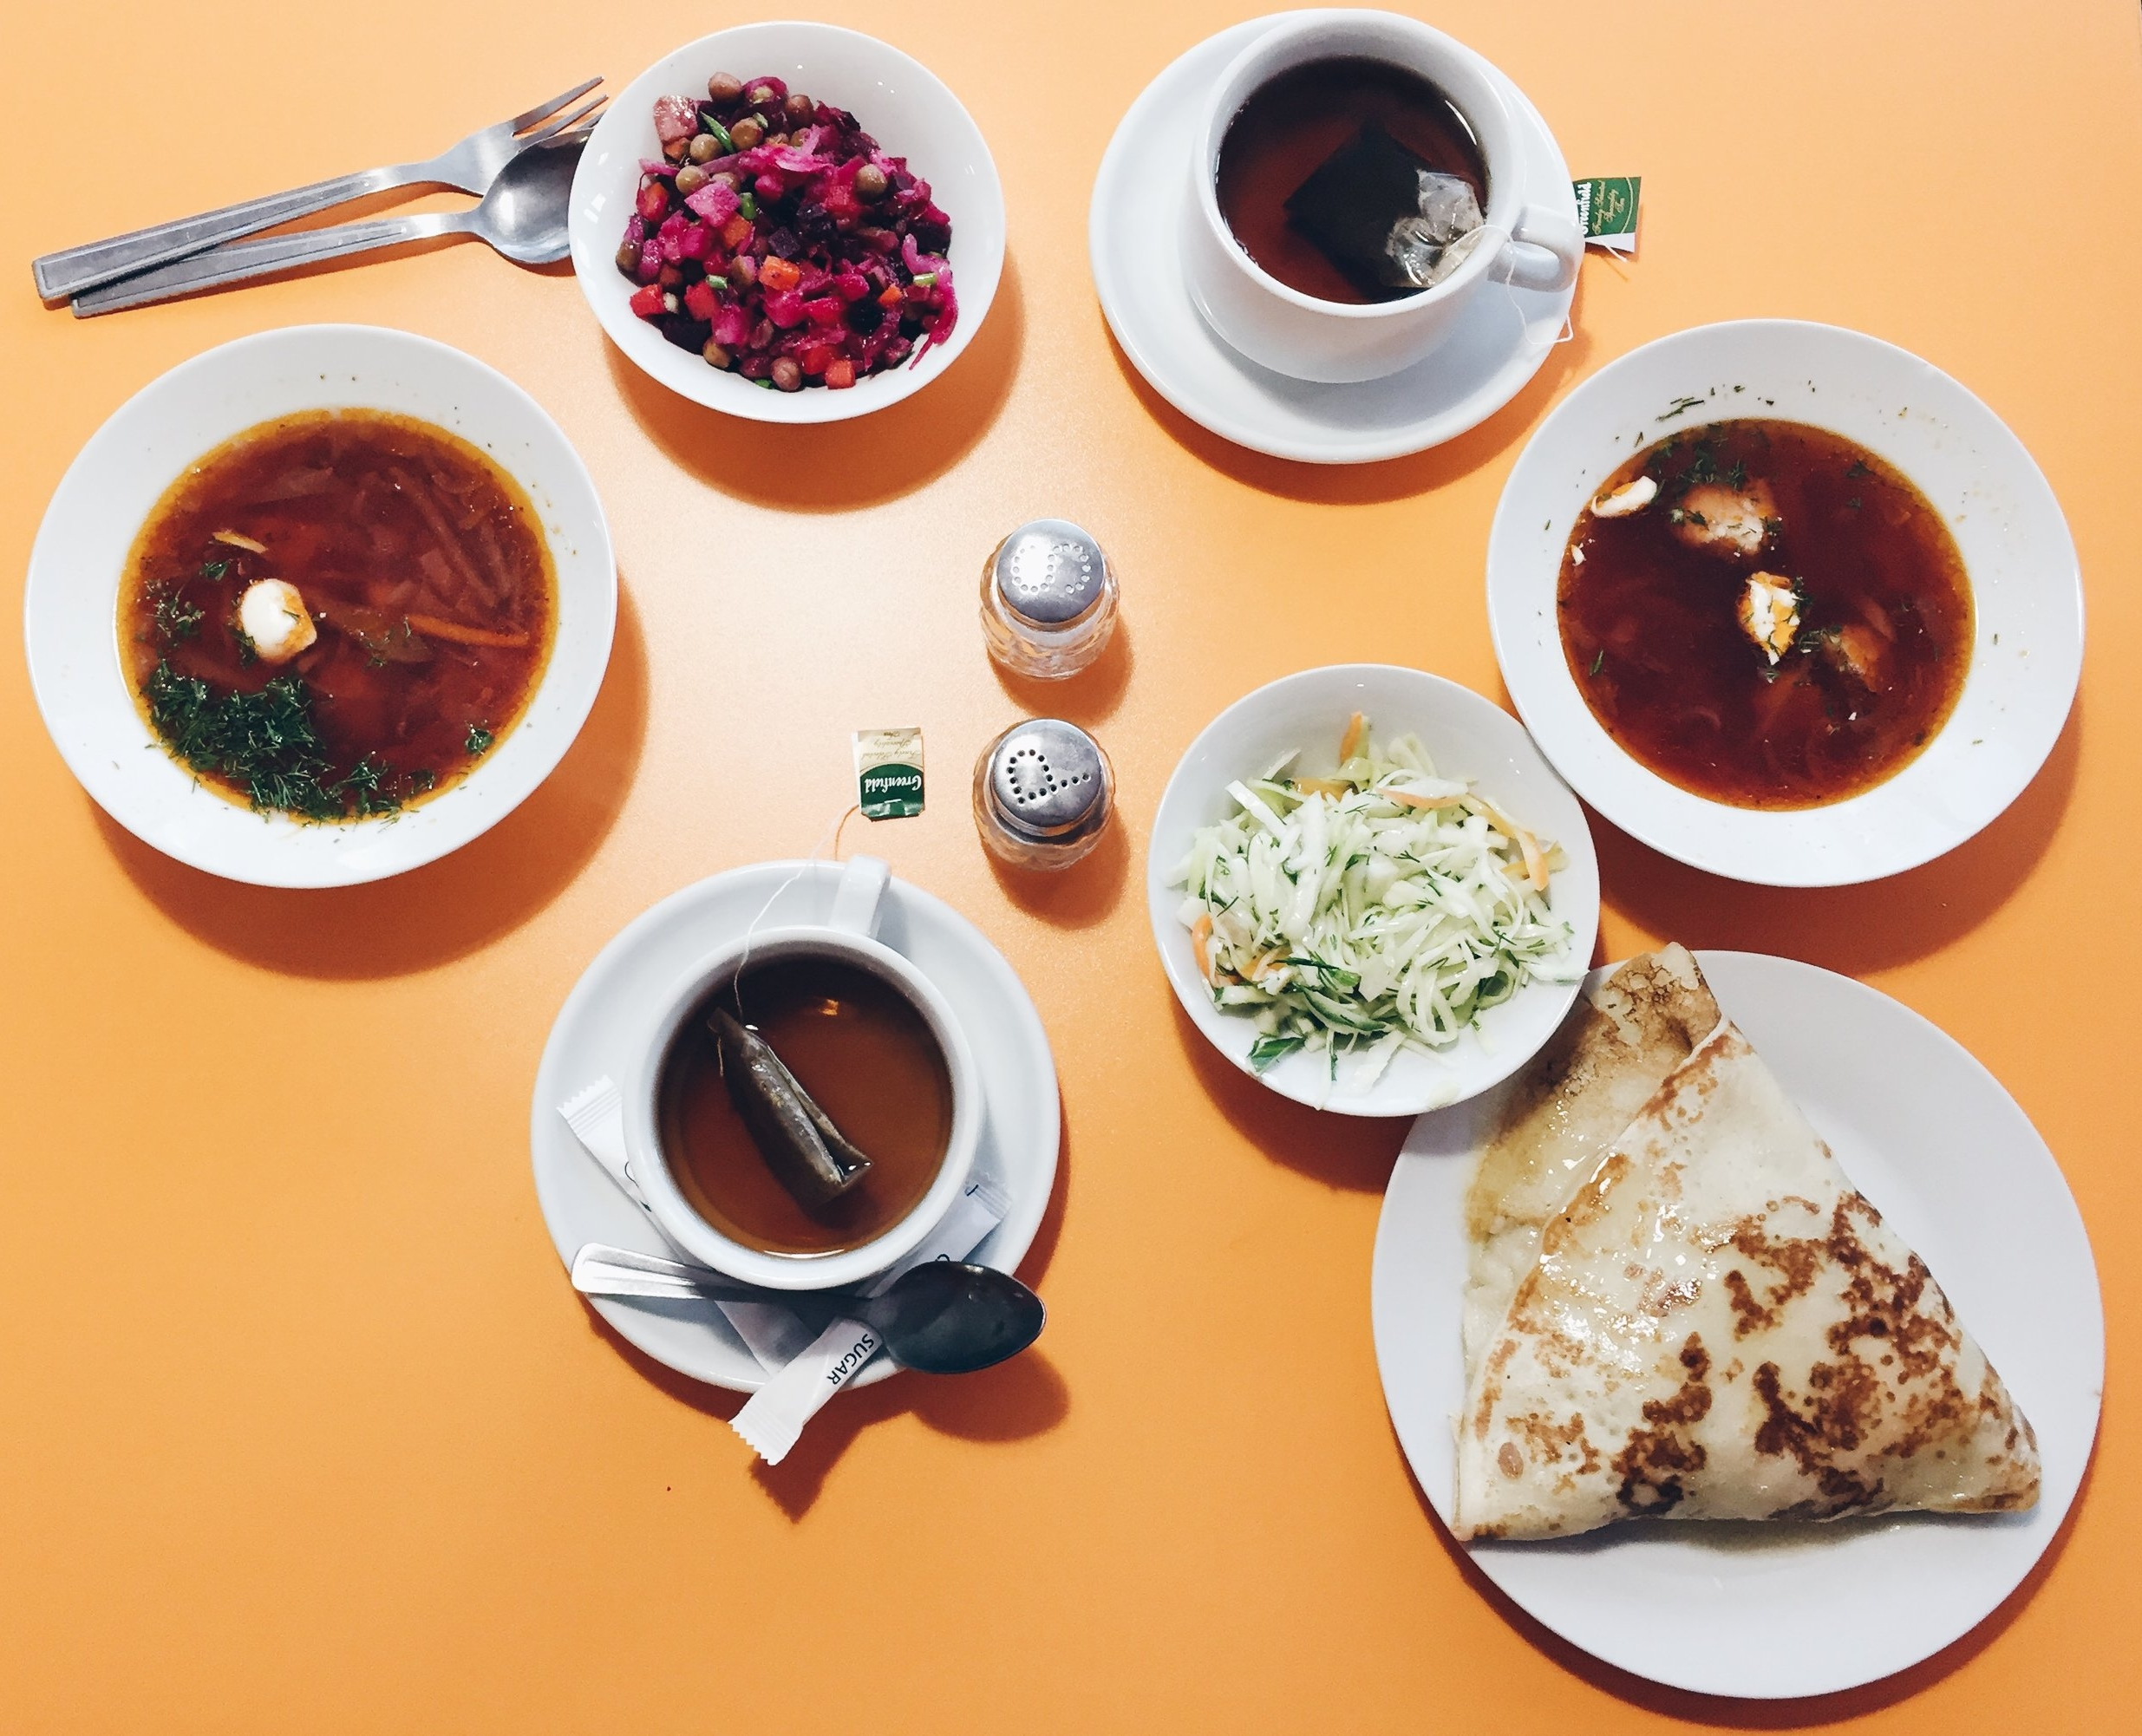 Soup:   Borscht   Salads:   Beet  (left); Cabbage  (right)  Blini:   Ham, mushroom, and cheese  Drink :  Black h   oney tea